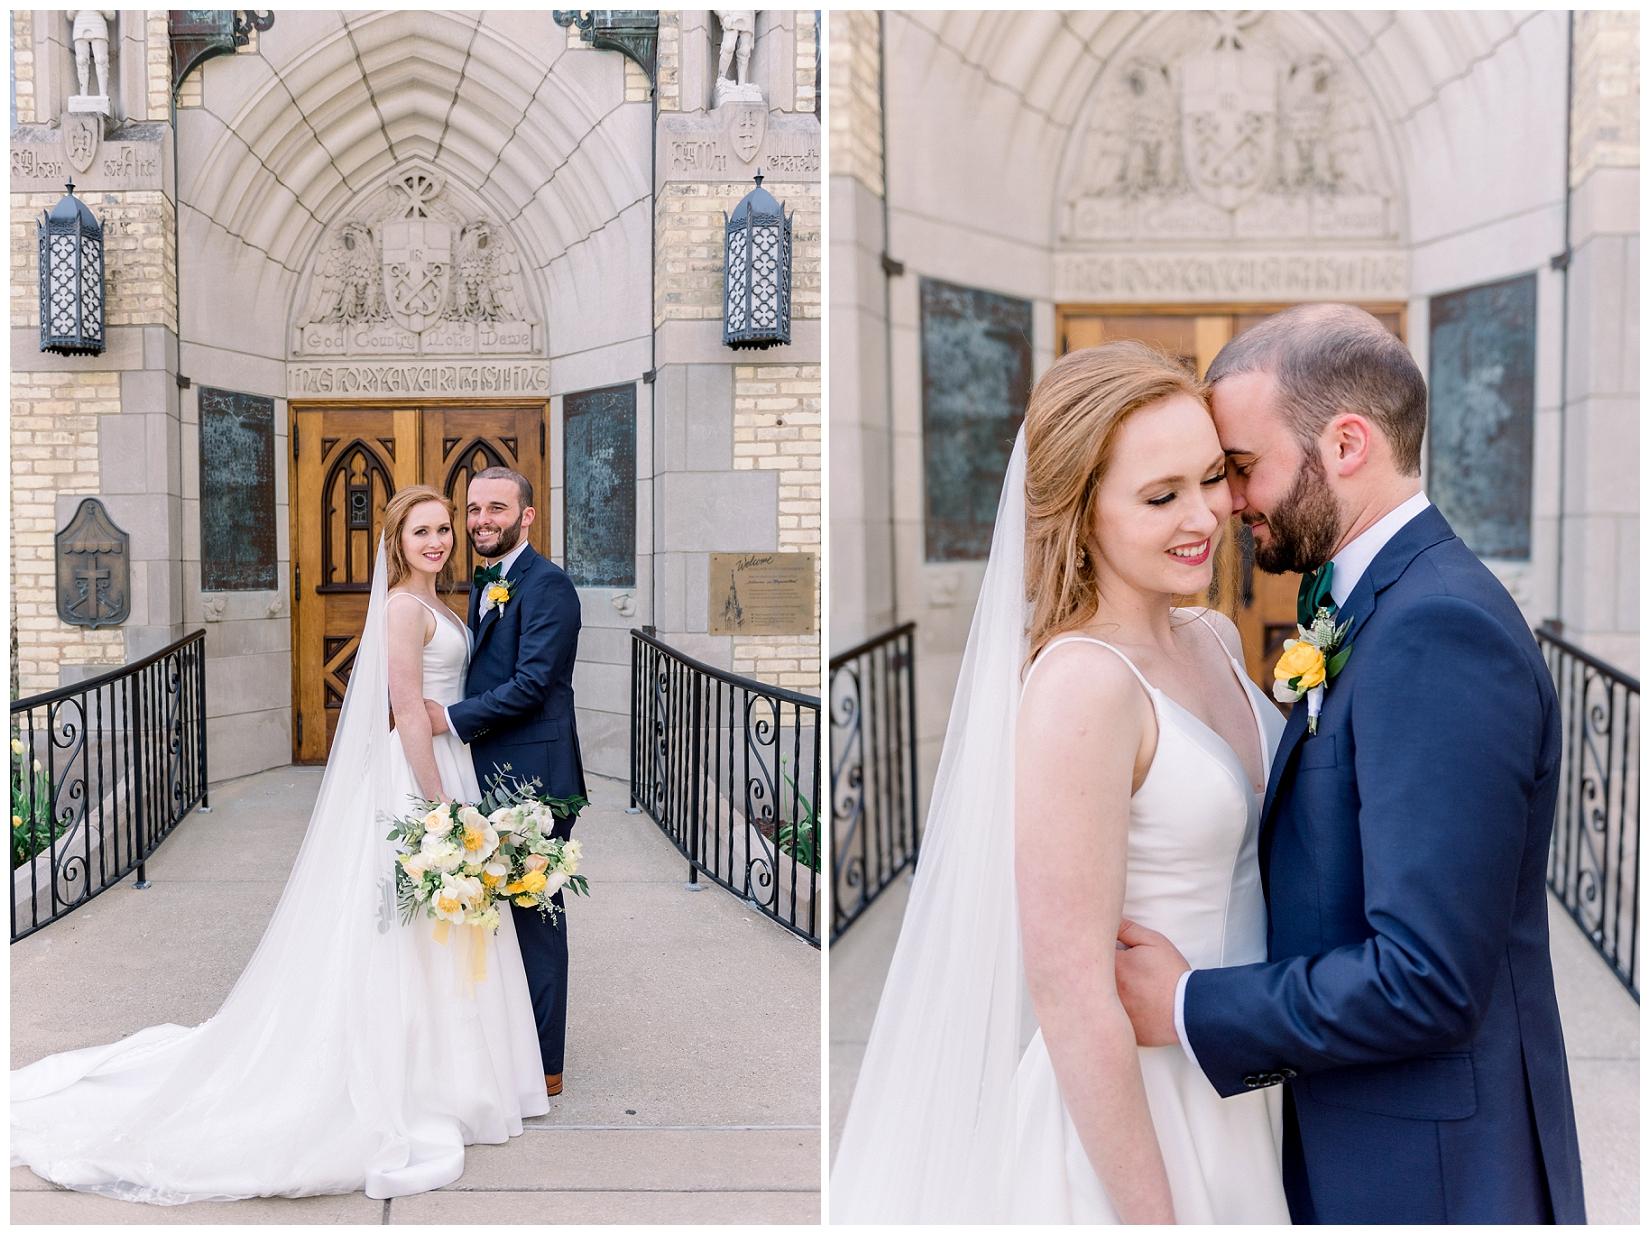 cat-alkire-wedding-photographer-indiana-chicago-indianapolis-fort-wayne_1204.jpg